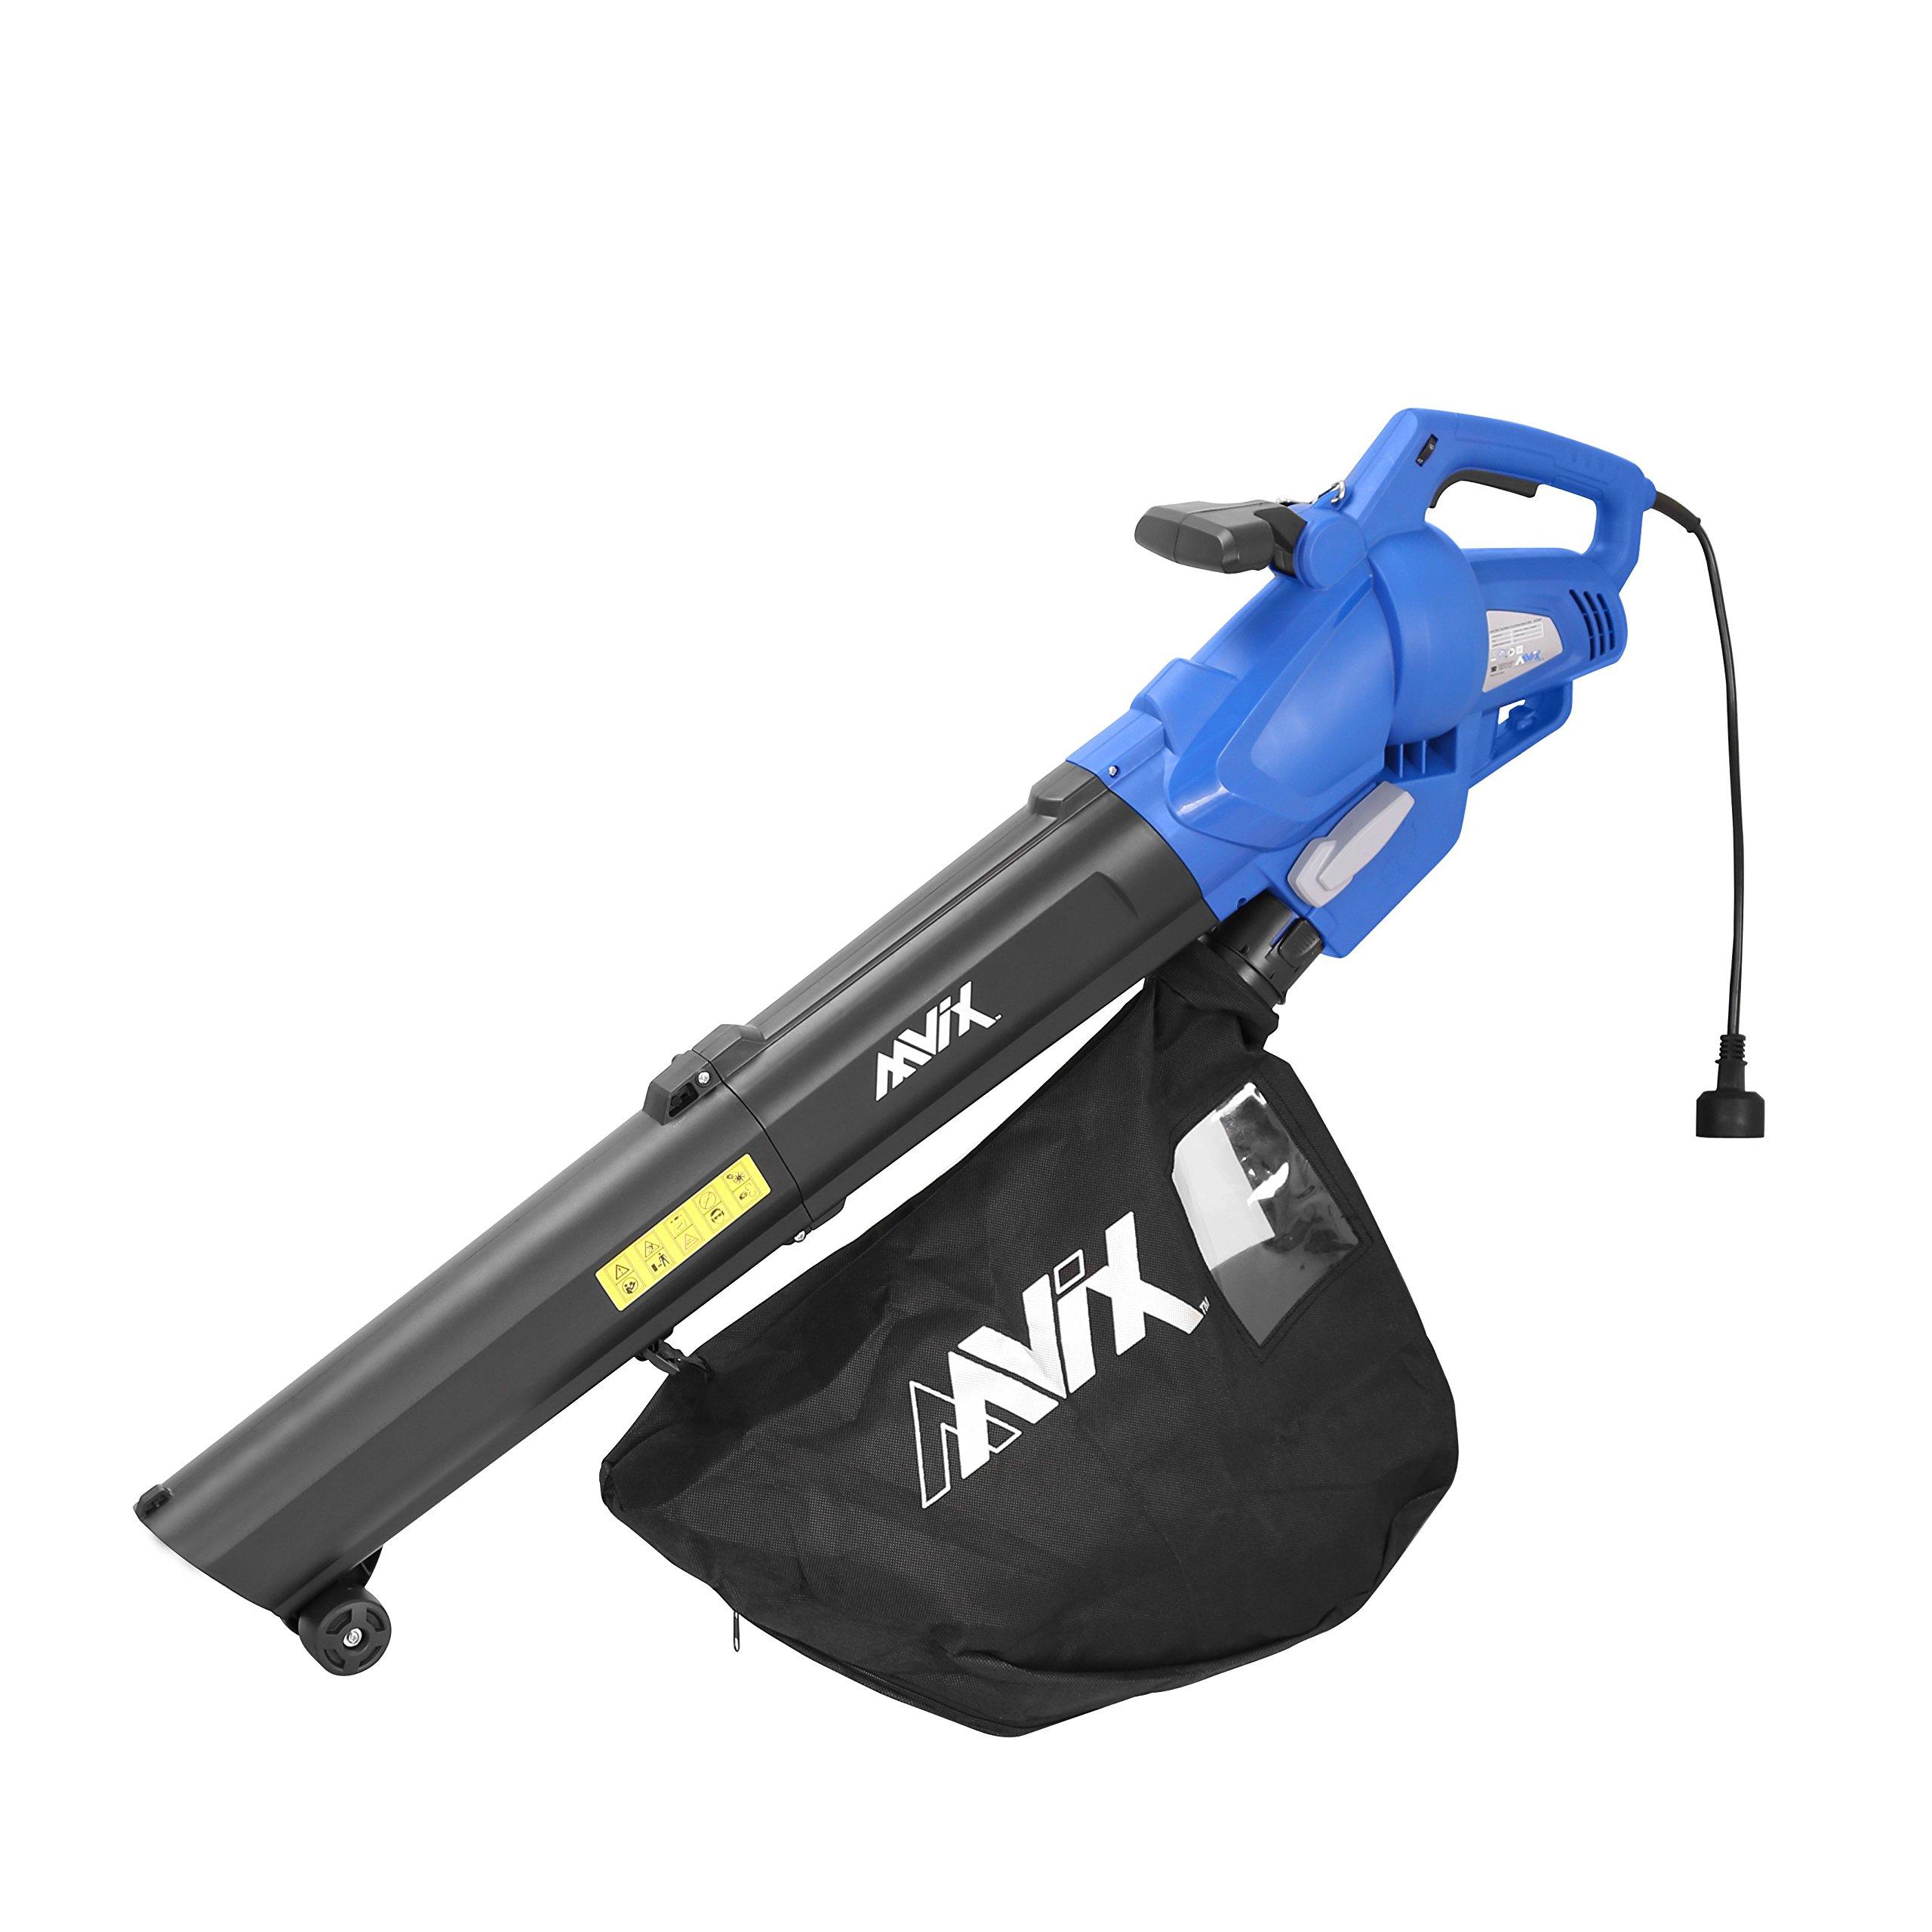 AAVIX AGT309 12 Amp All-In-One Blower/Mulcher/Vacuum 6 Speeds Electric Blower, Blue